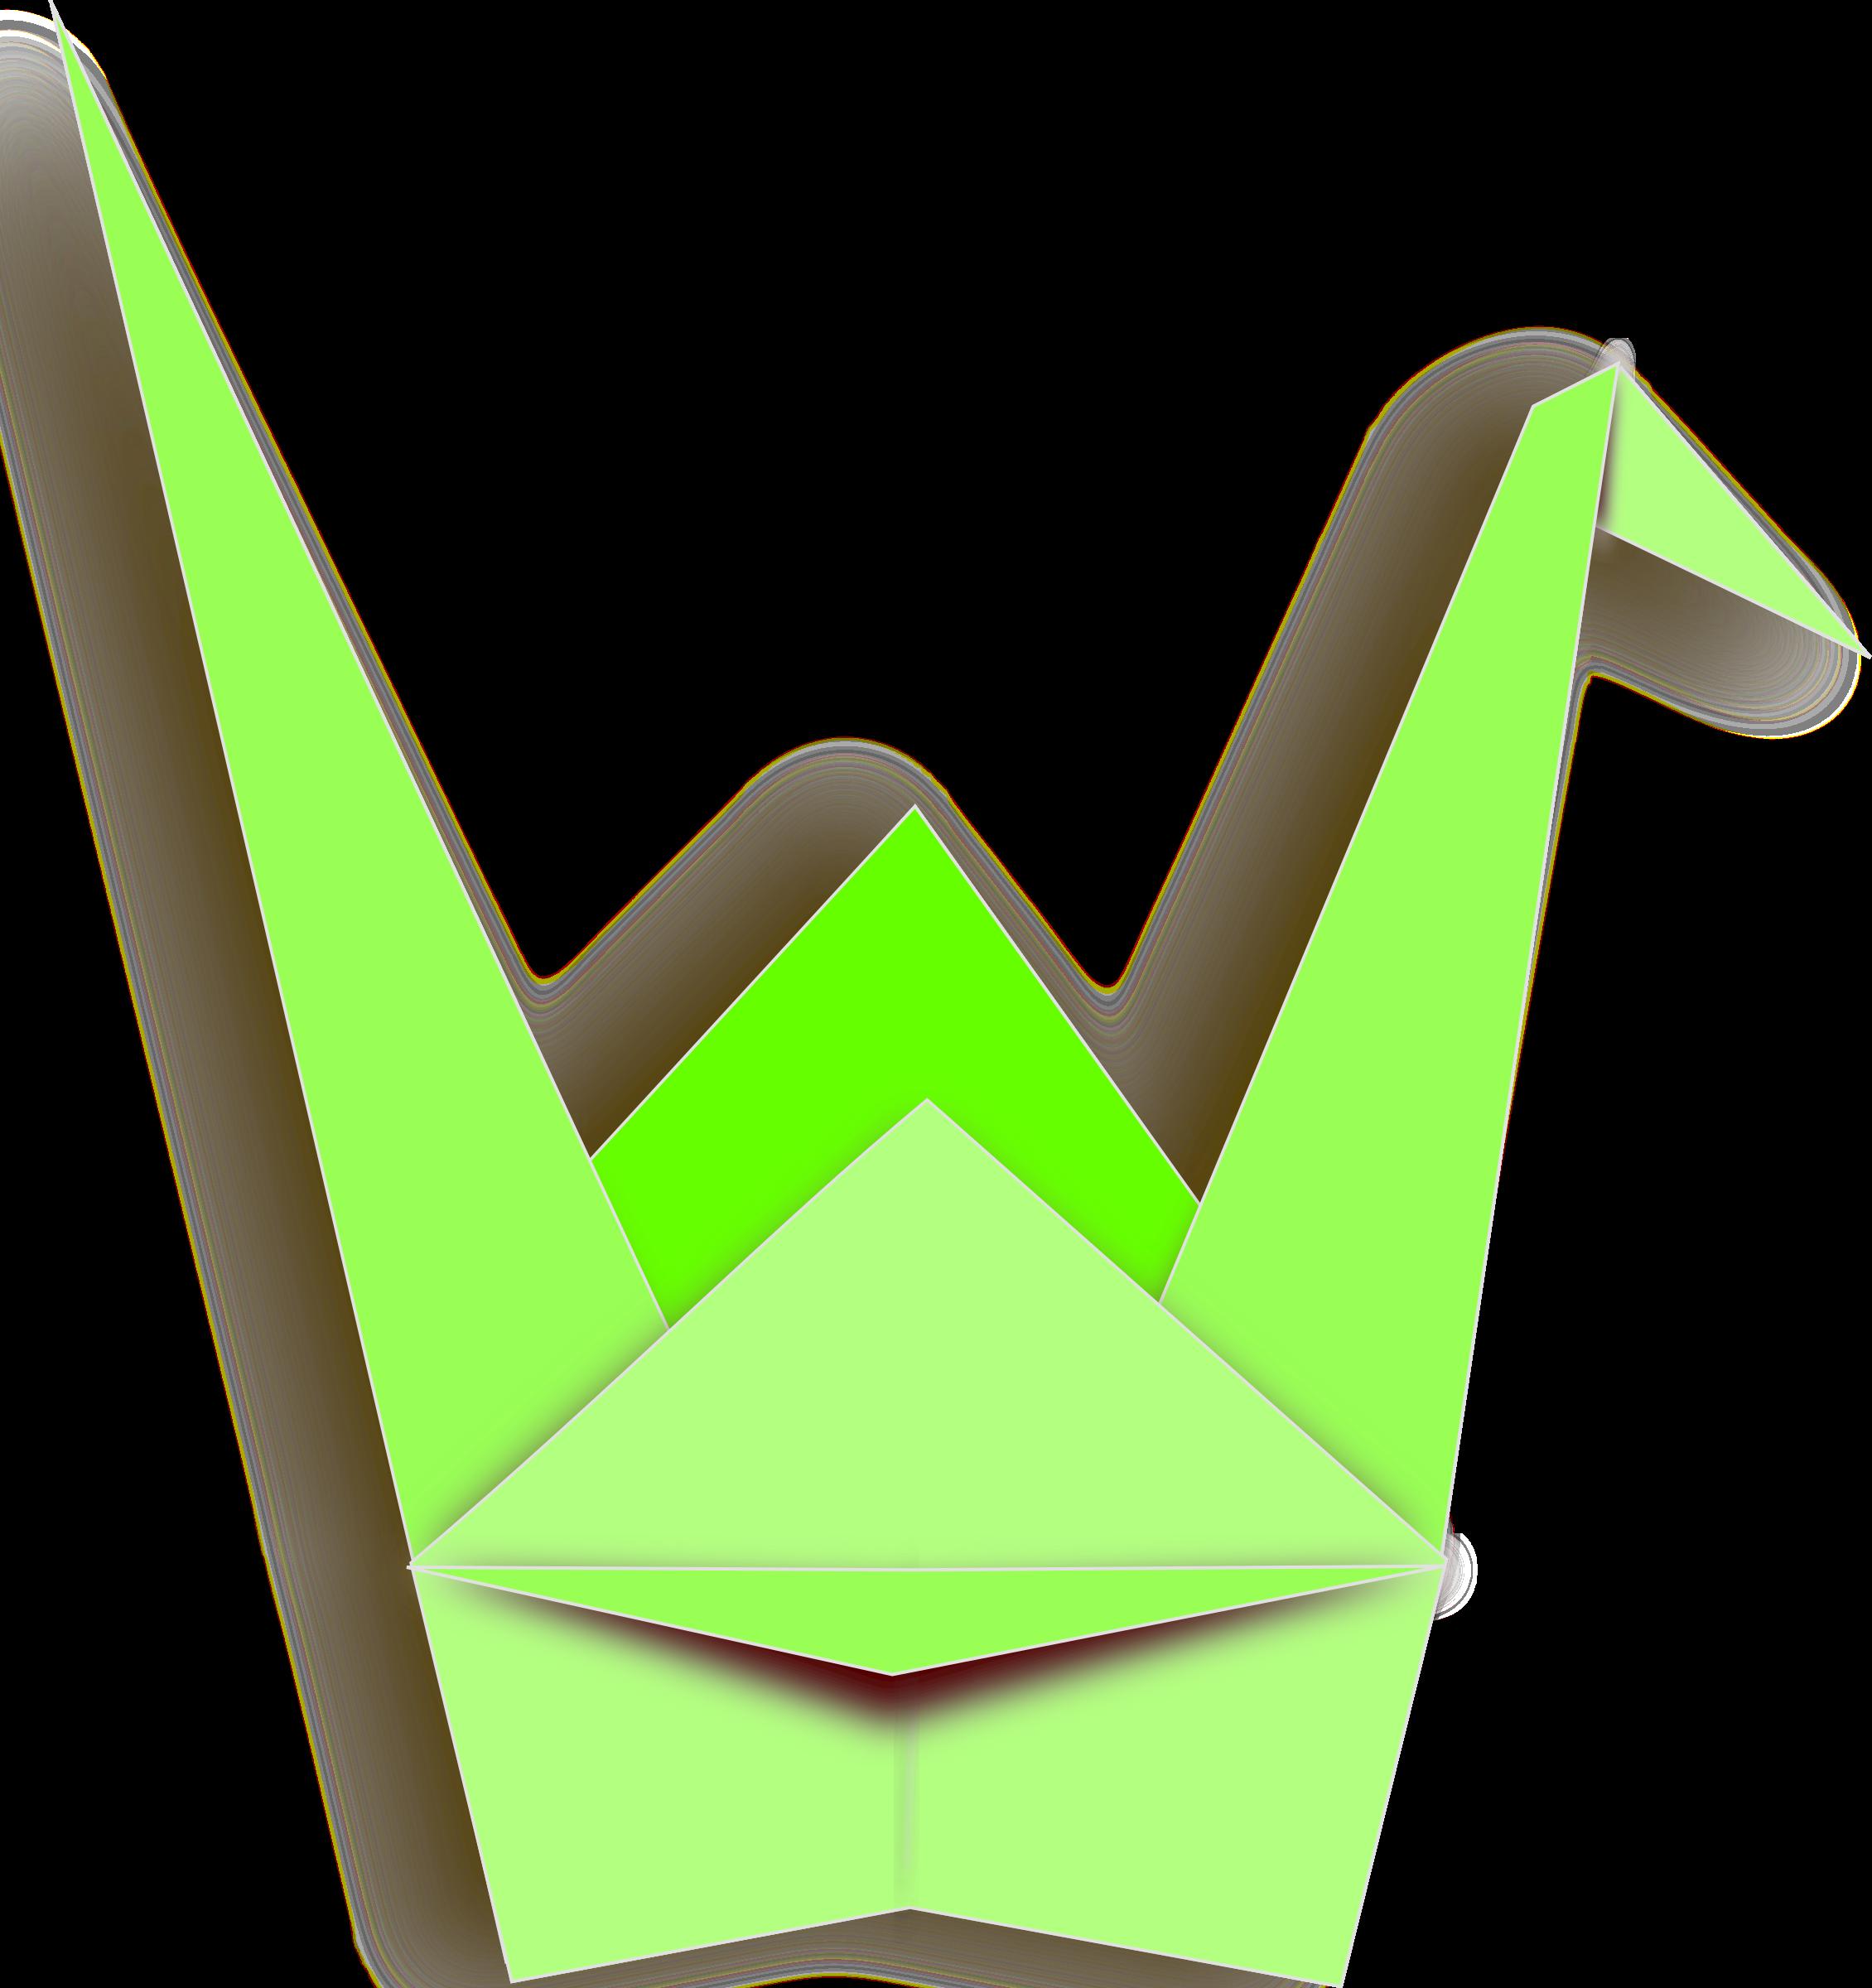 2260x2400 Origami Paper Cranes For Japan Hapamama Paper Crane Drawing Paper